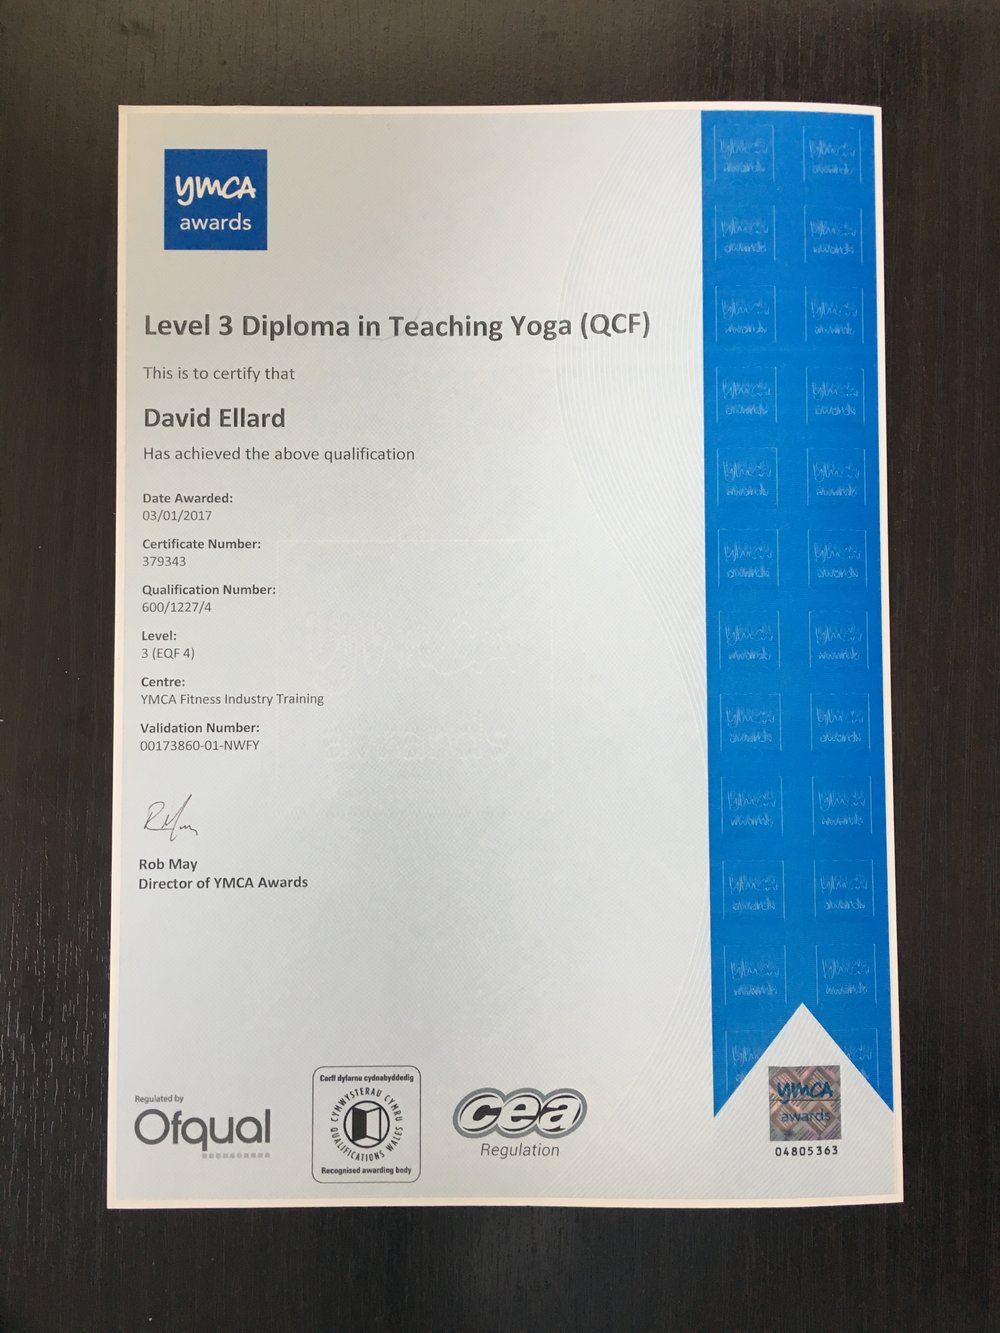 David_Ellard_Yoga_Certification